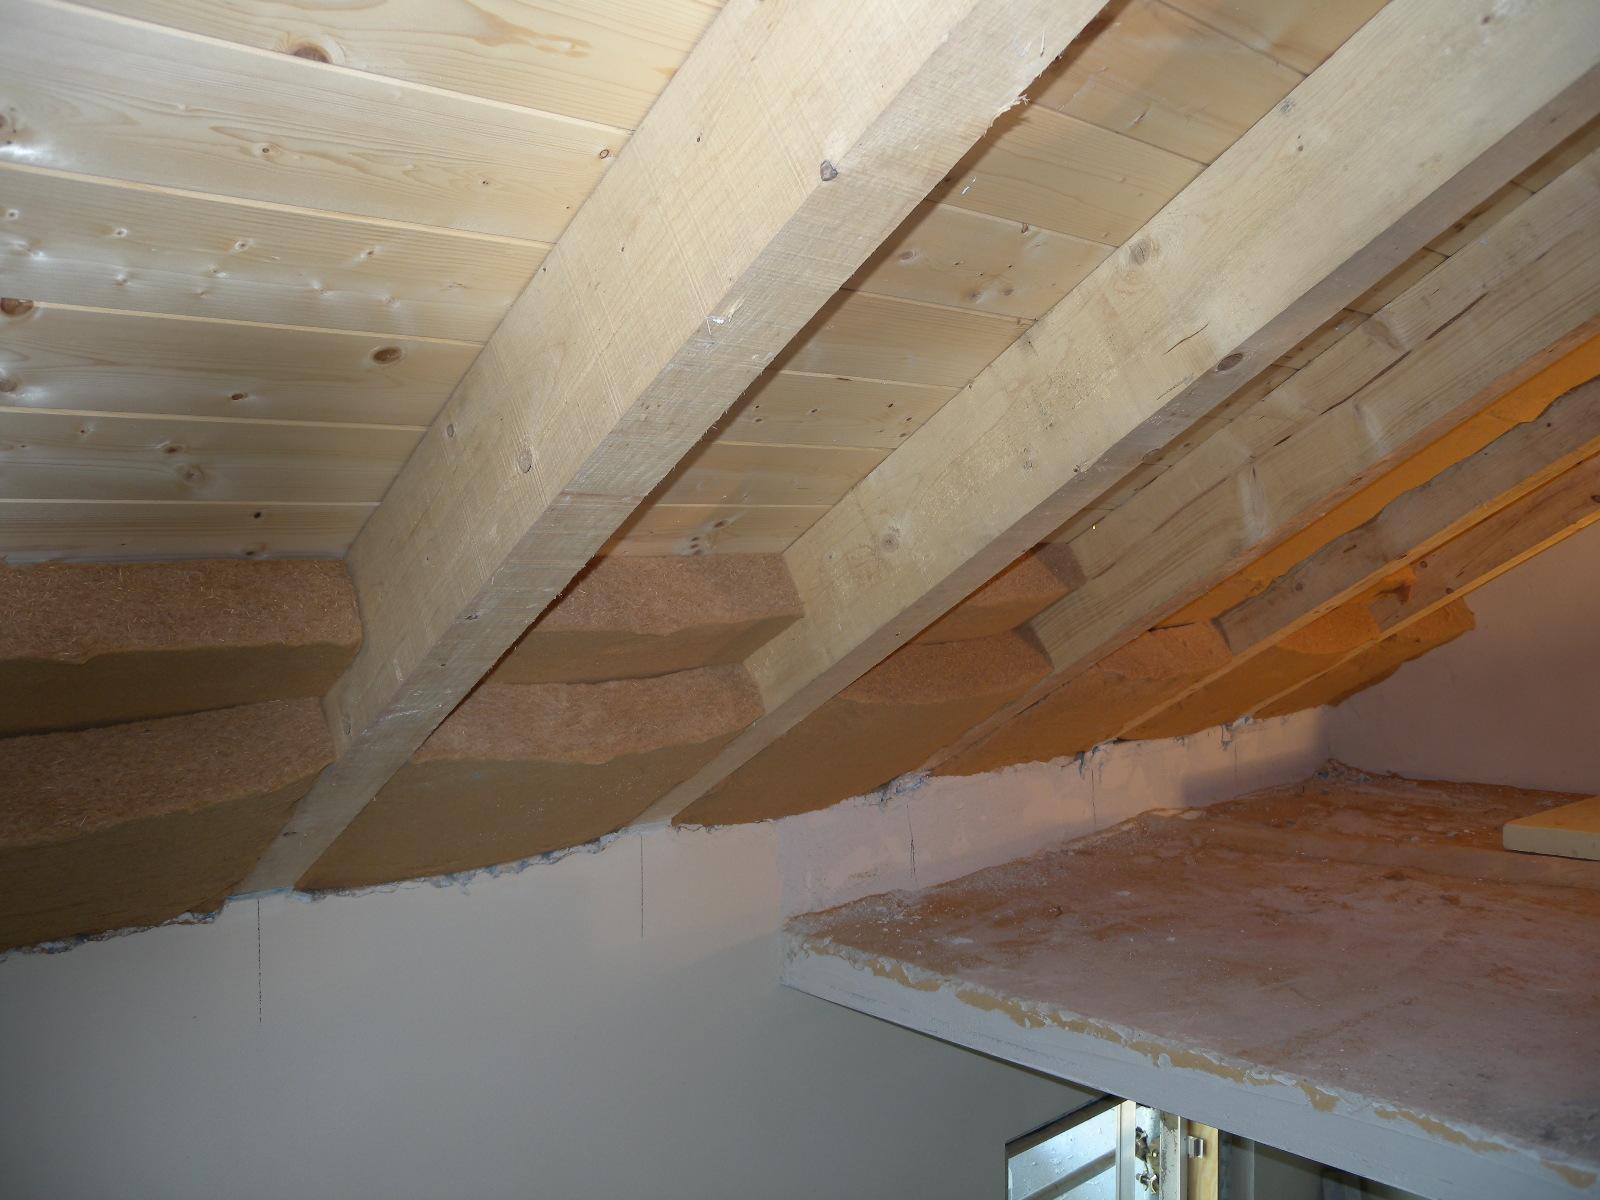 Coibentare soffitto dall interno casamia idea di immagine - Isolare il soffitto dall interno ...